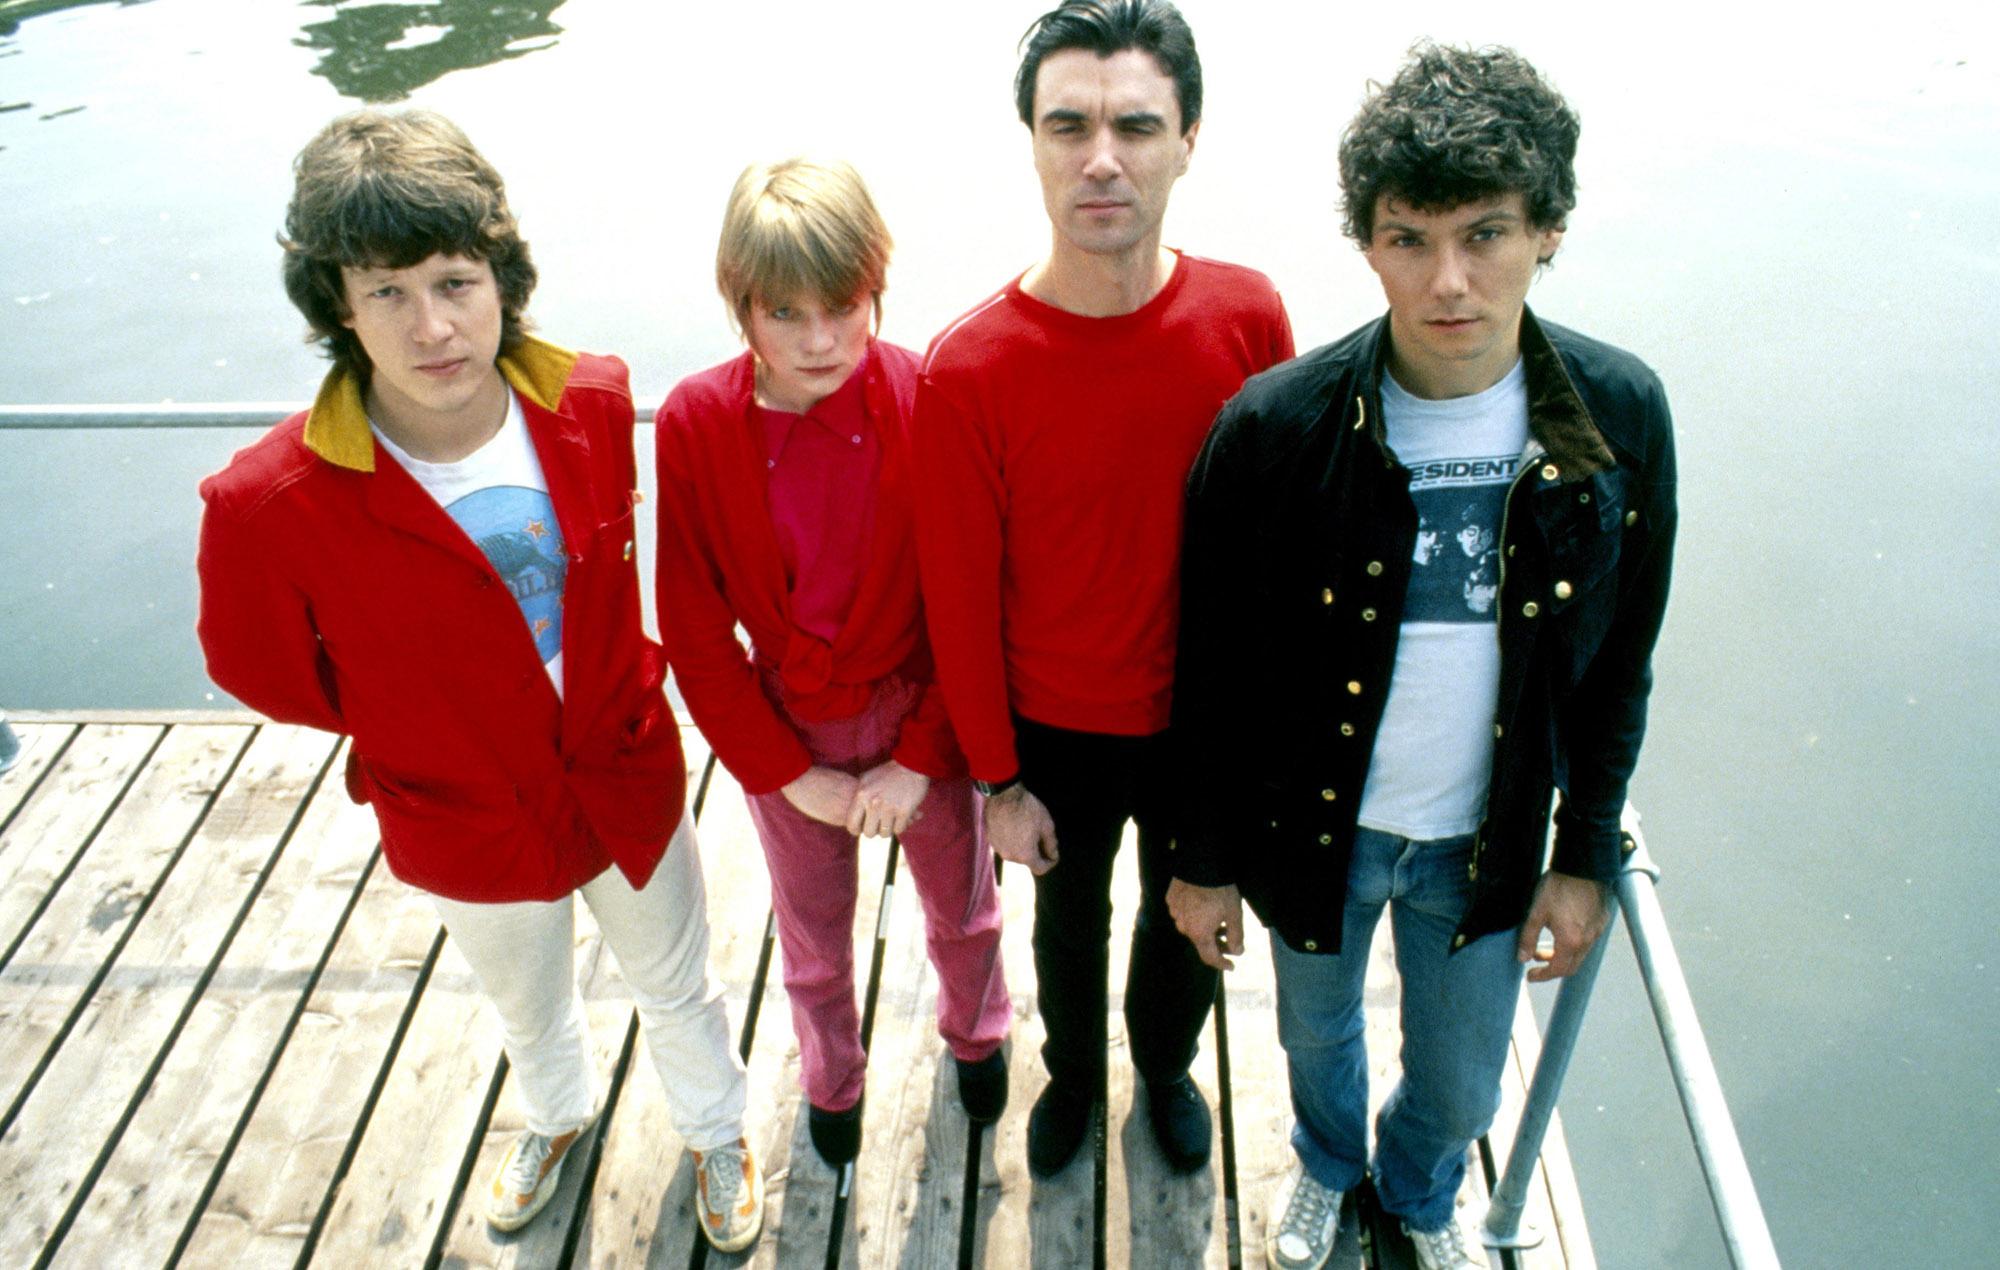 Chris Franz (far left) with Talking Heads in 1977(Photo by Gijsbert Hanekroot/Redferns)